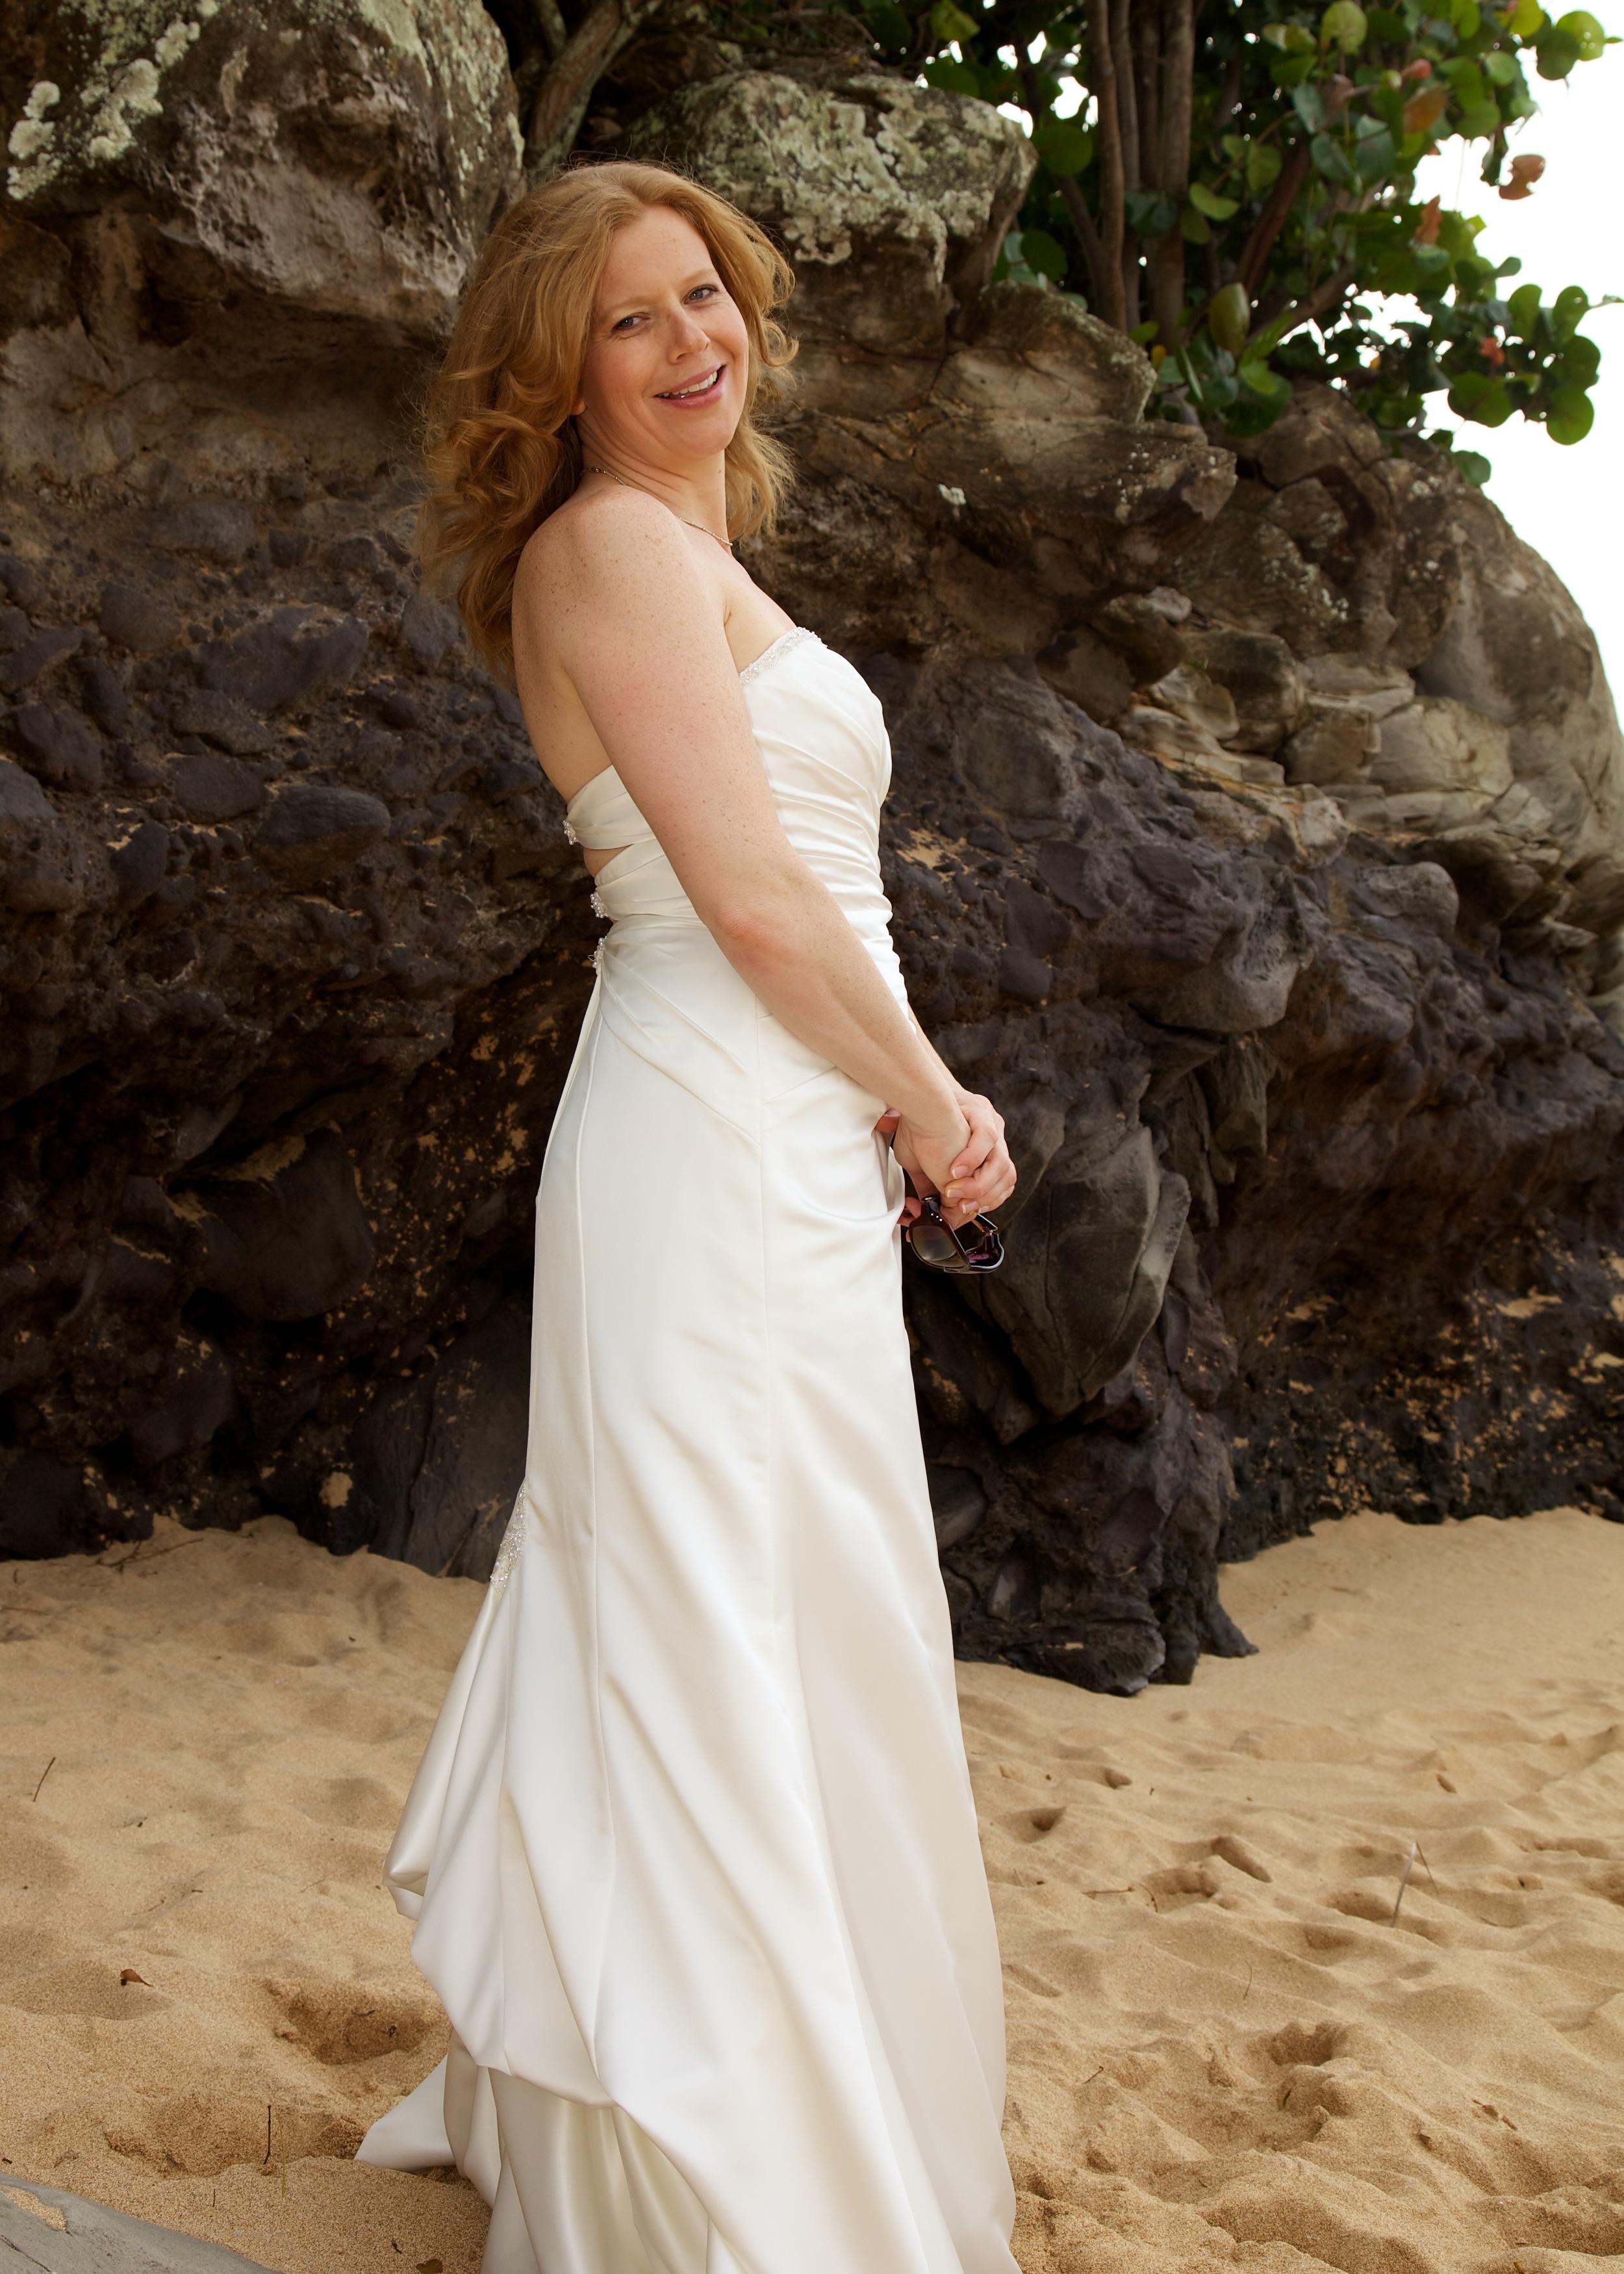 Wedding++28029+%2819+of+50%29-1766405776-O.jpg